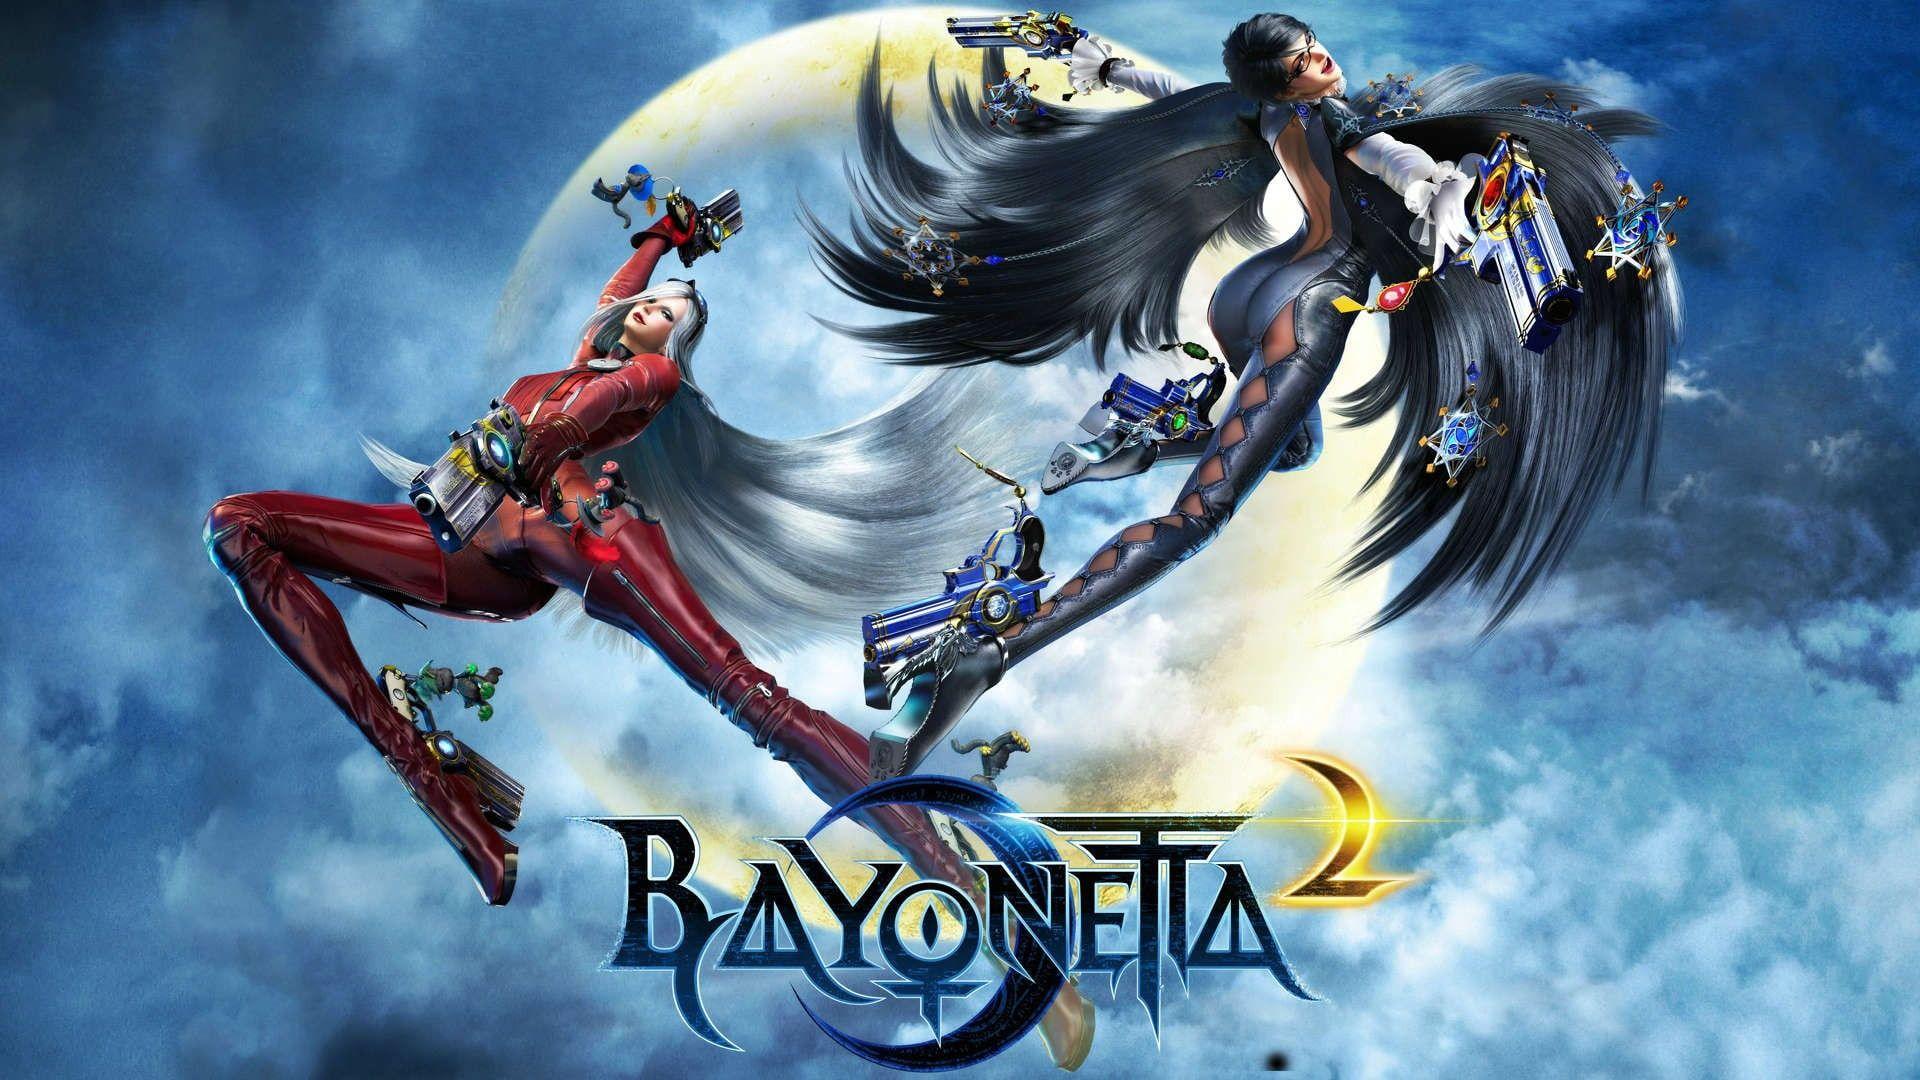 Bayonetta Bayonetta 2 Video Games 1080p Wallpaper Hdwallpaper Desktop Bayonetta Wii U Video Games